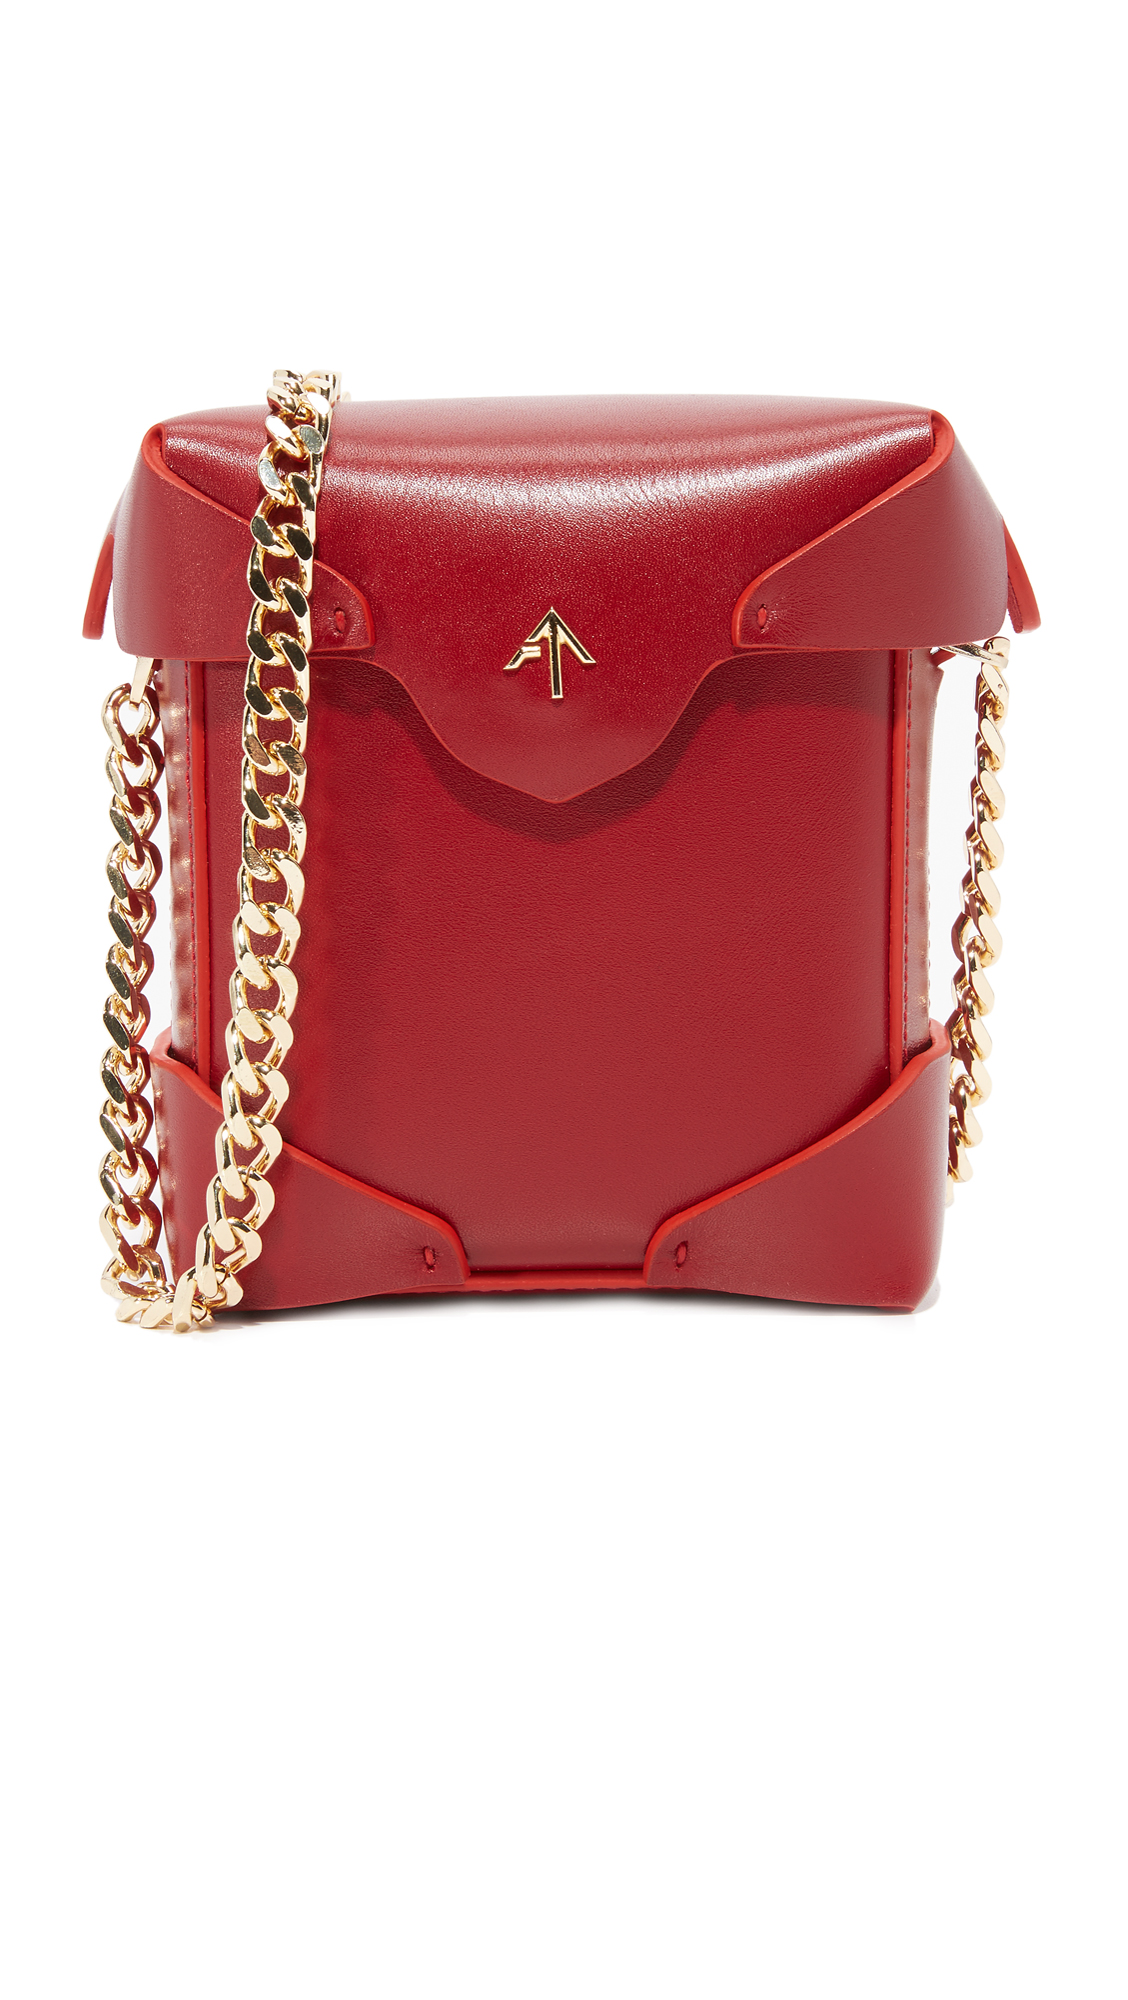 MANU Atelier Micro Pristine Box Bag - Red